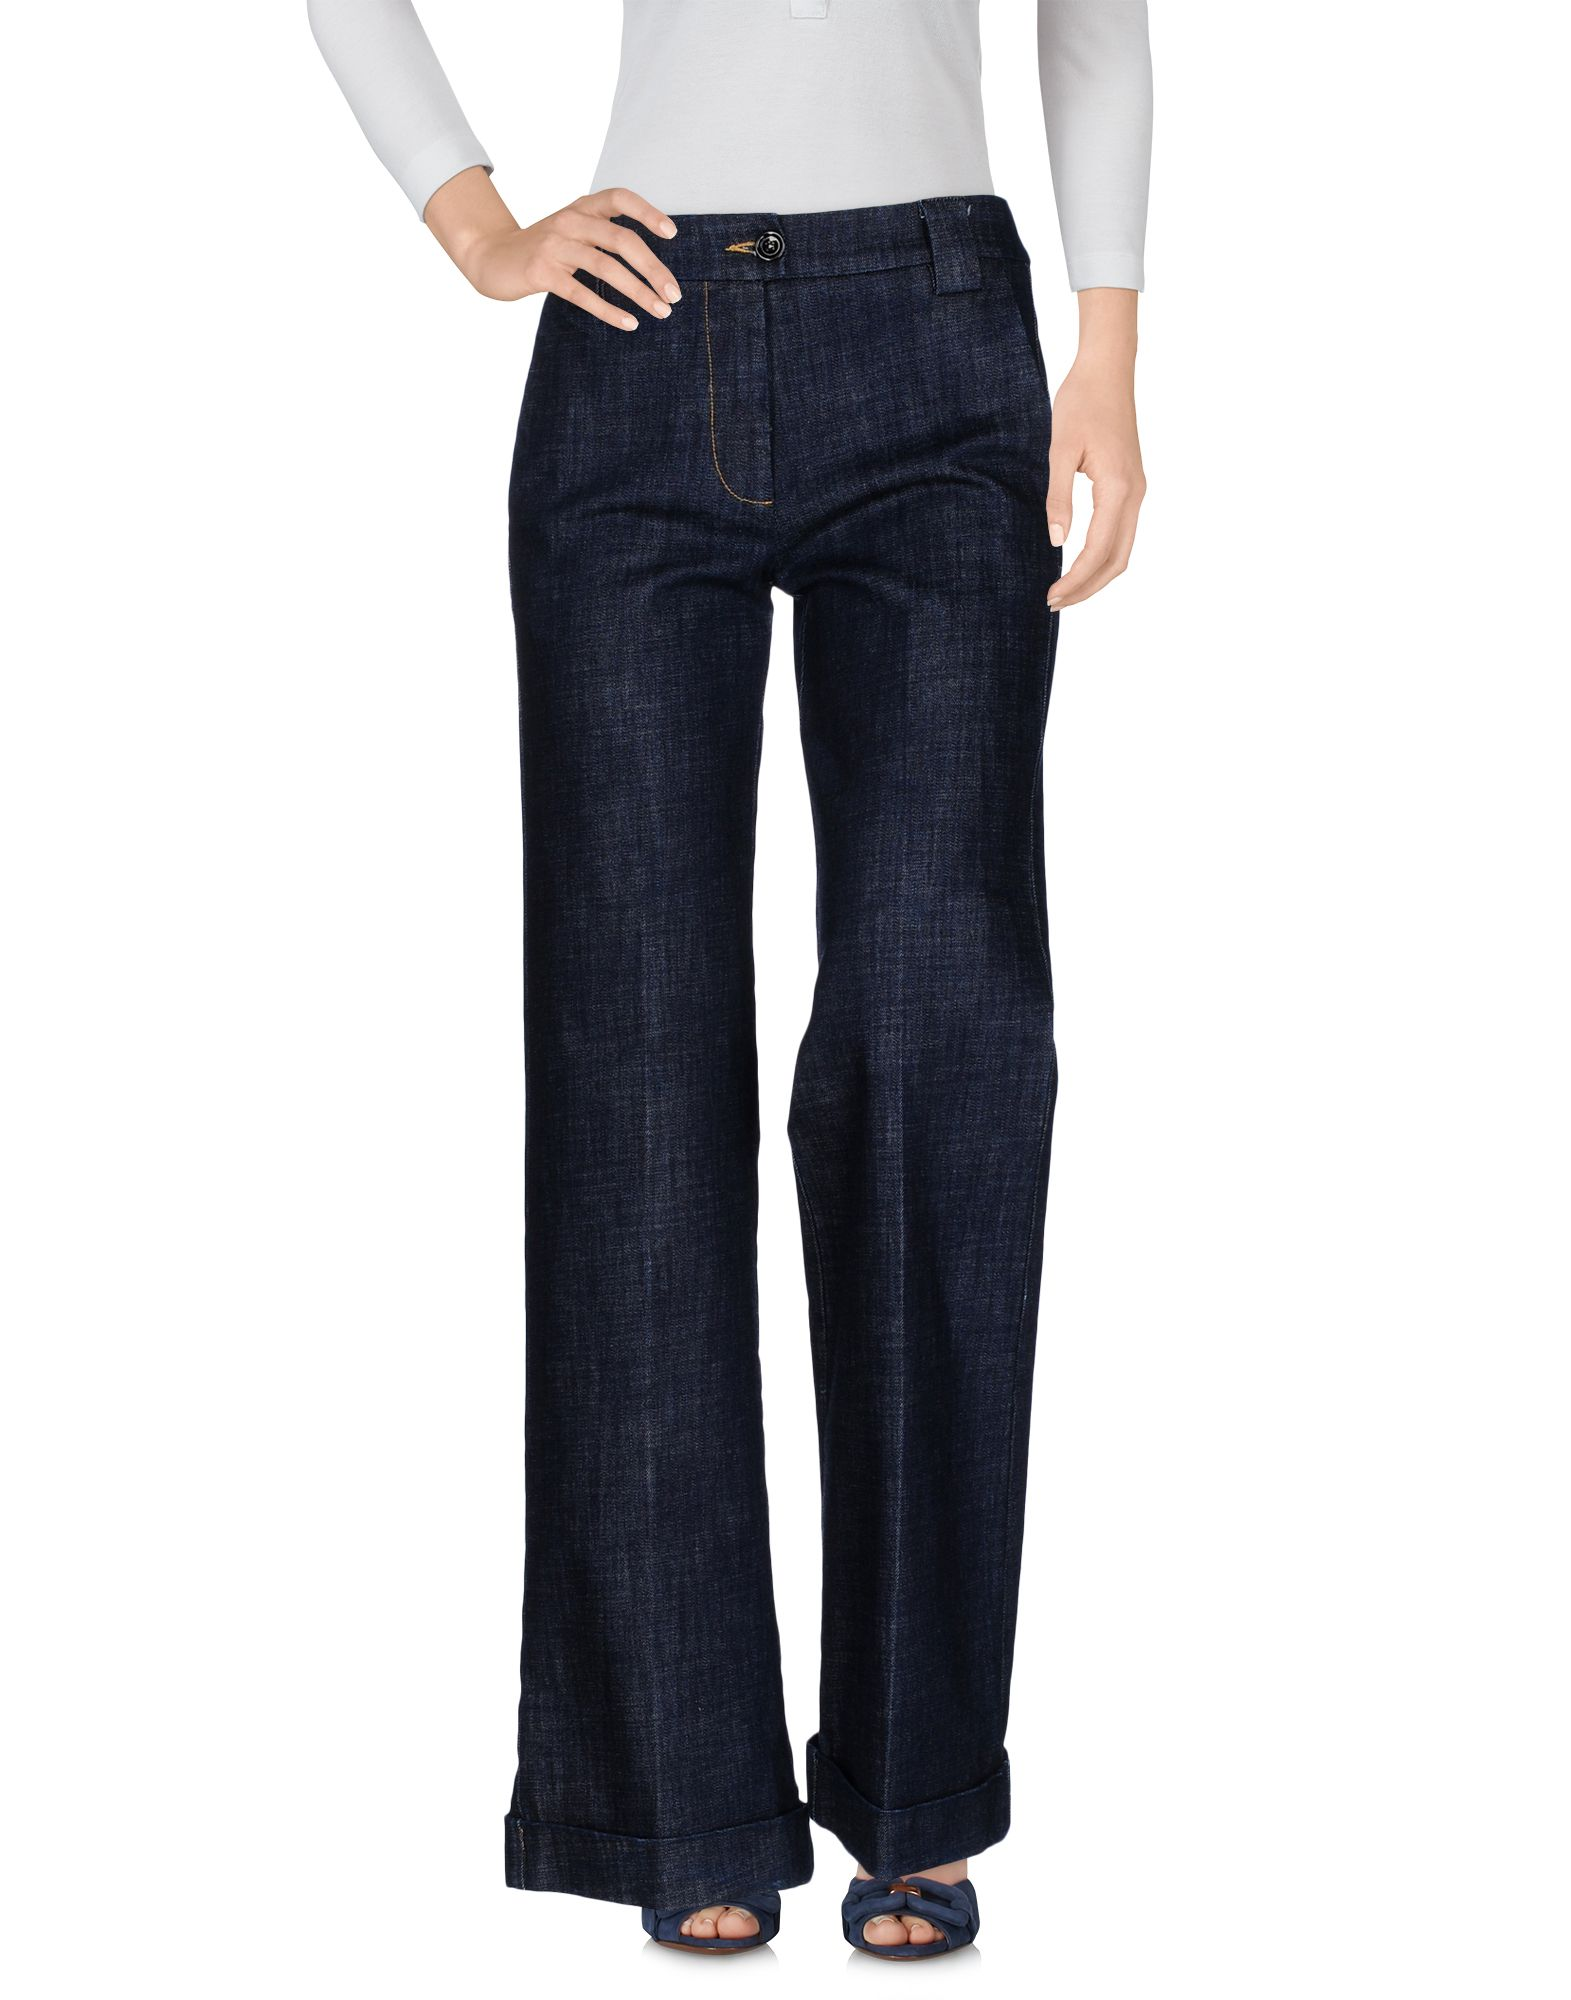 ATTIC AND BARN Джинсовые брюки